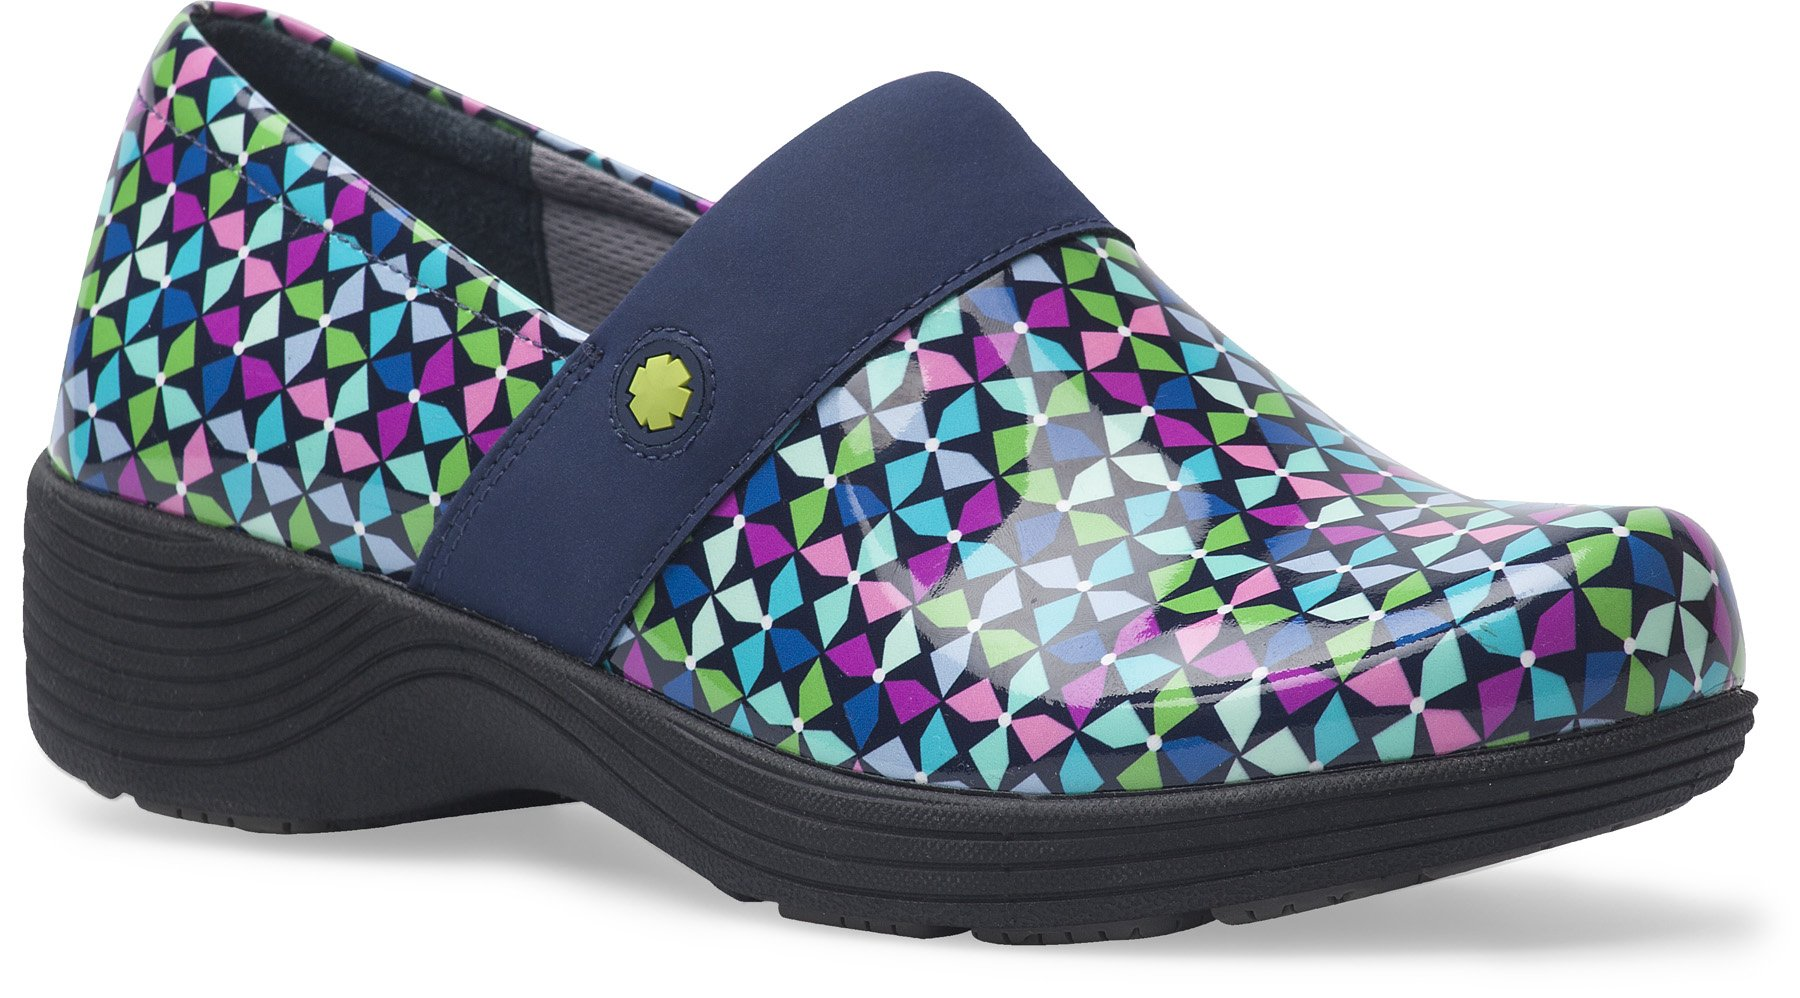 Work Wonders by Dansko Women's Camellia Slip Resistant Shoe- Pinwheel Patent- 39 M EU (8.5-9 US)